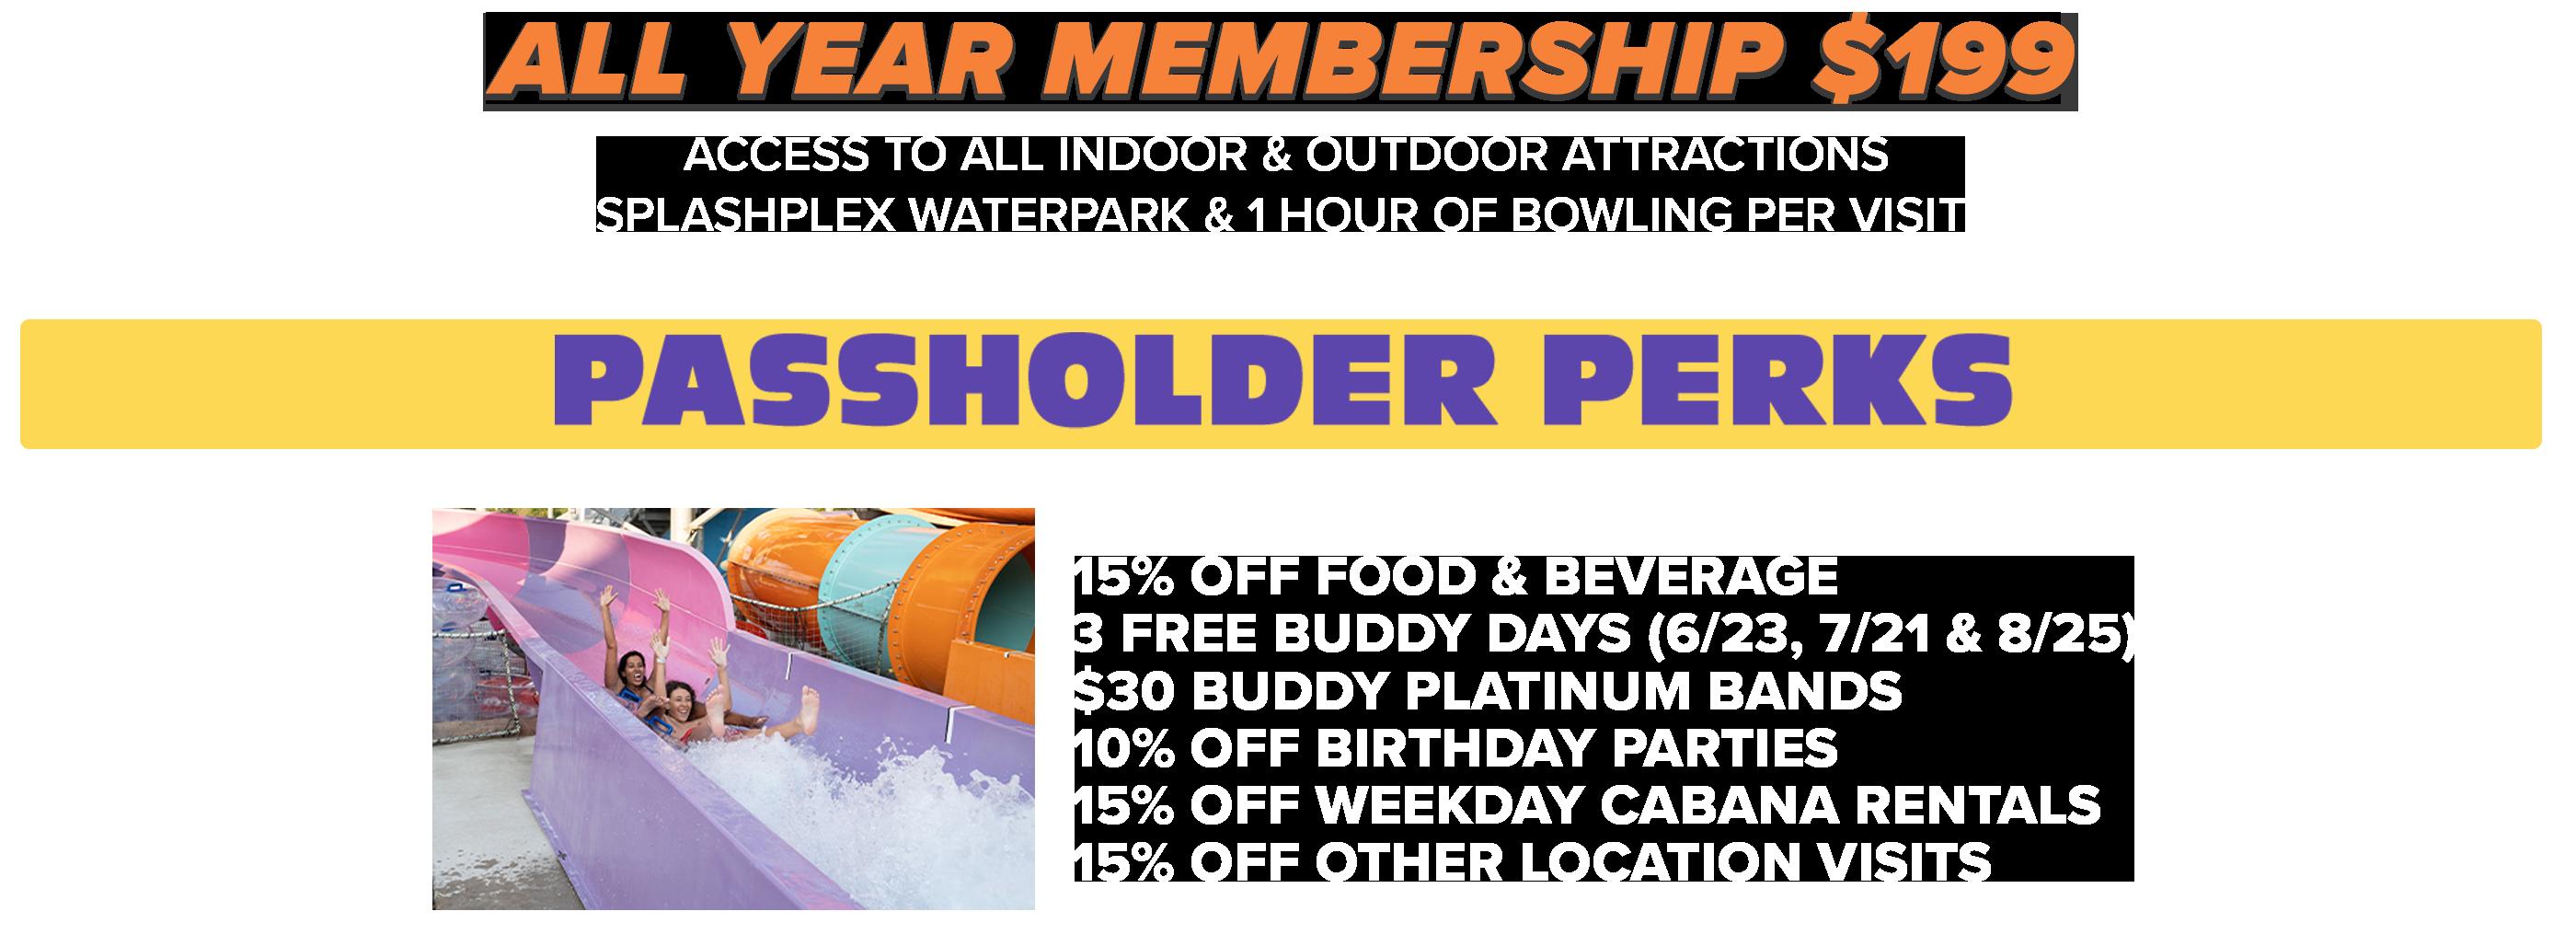 MembershipPage-ML-PassholderPerks-AllYear-LARGE